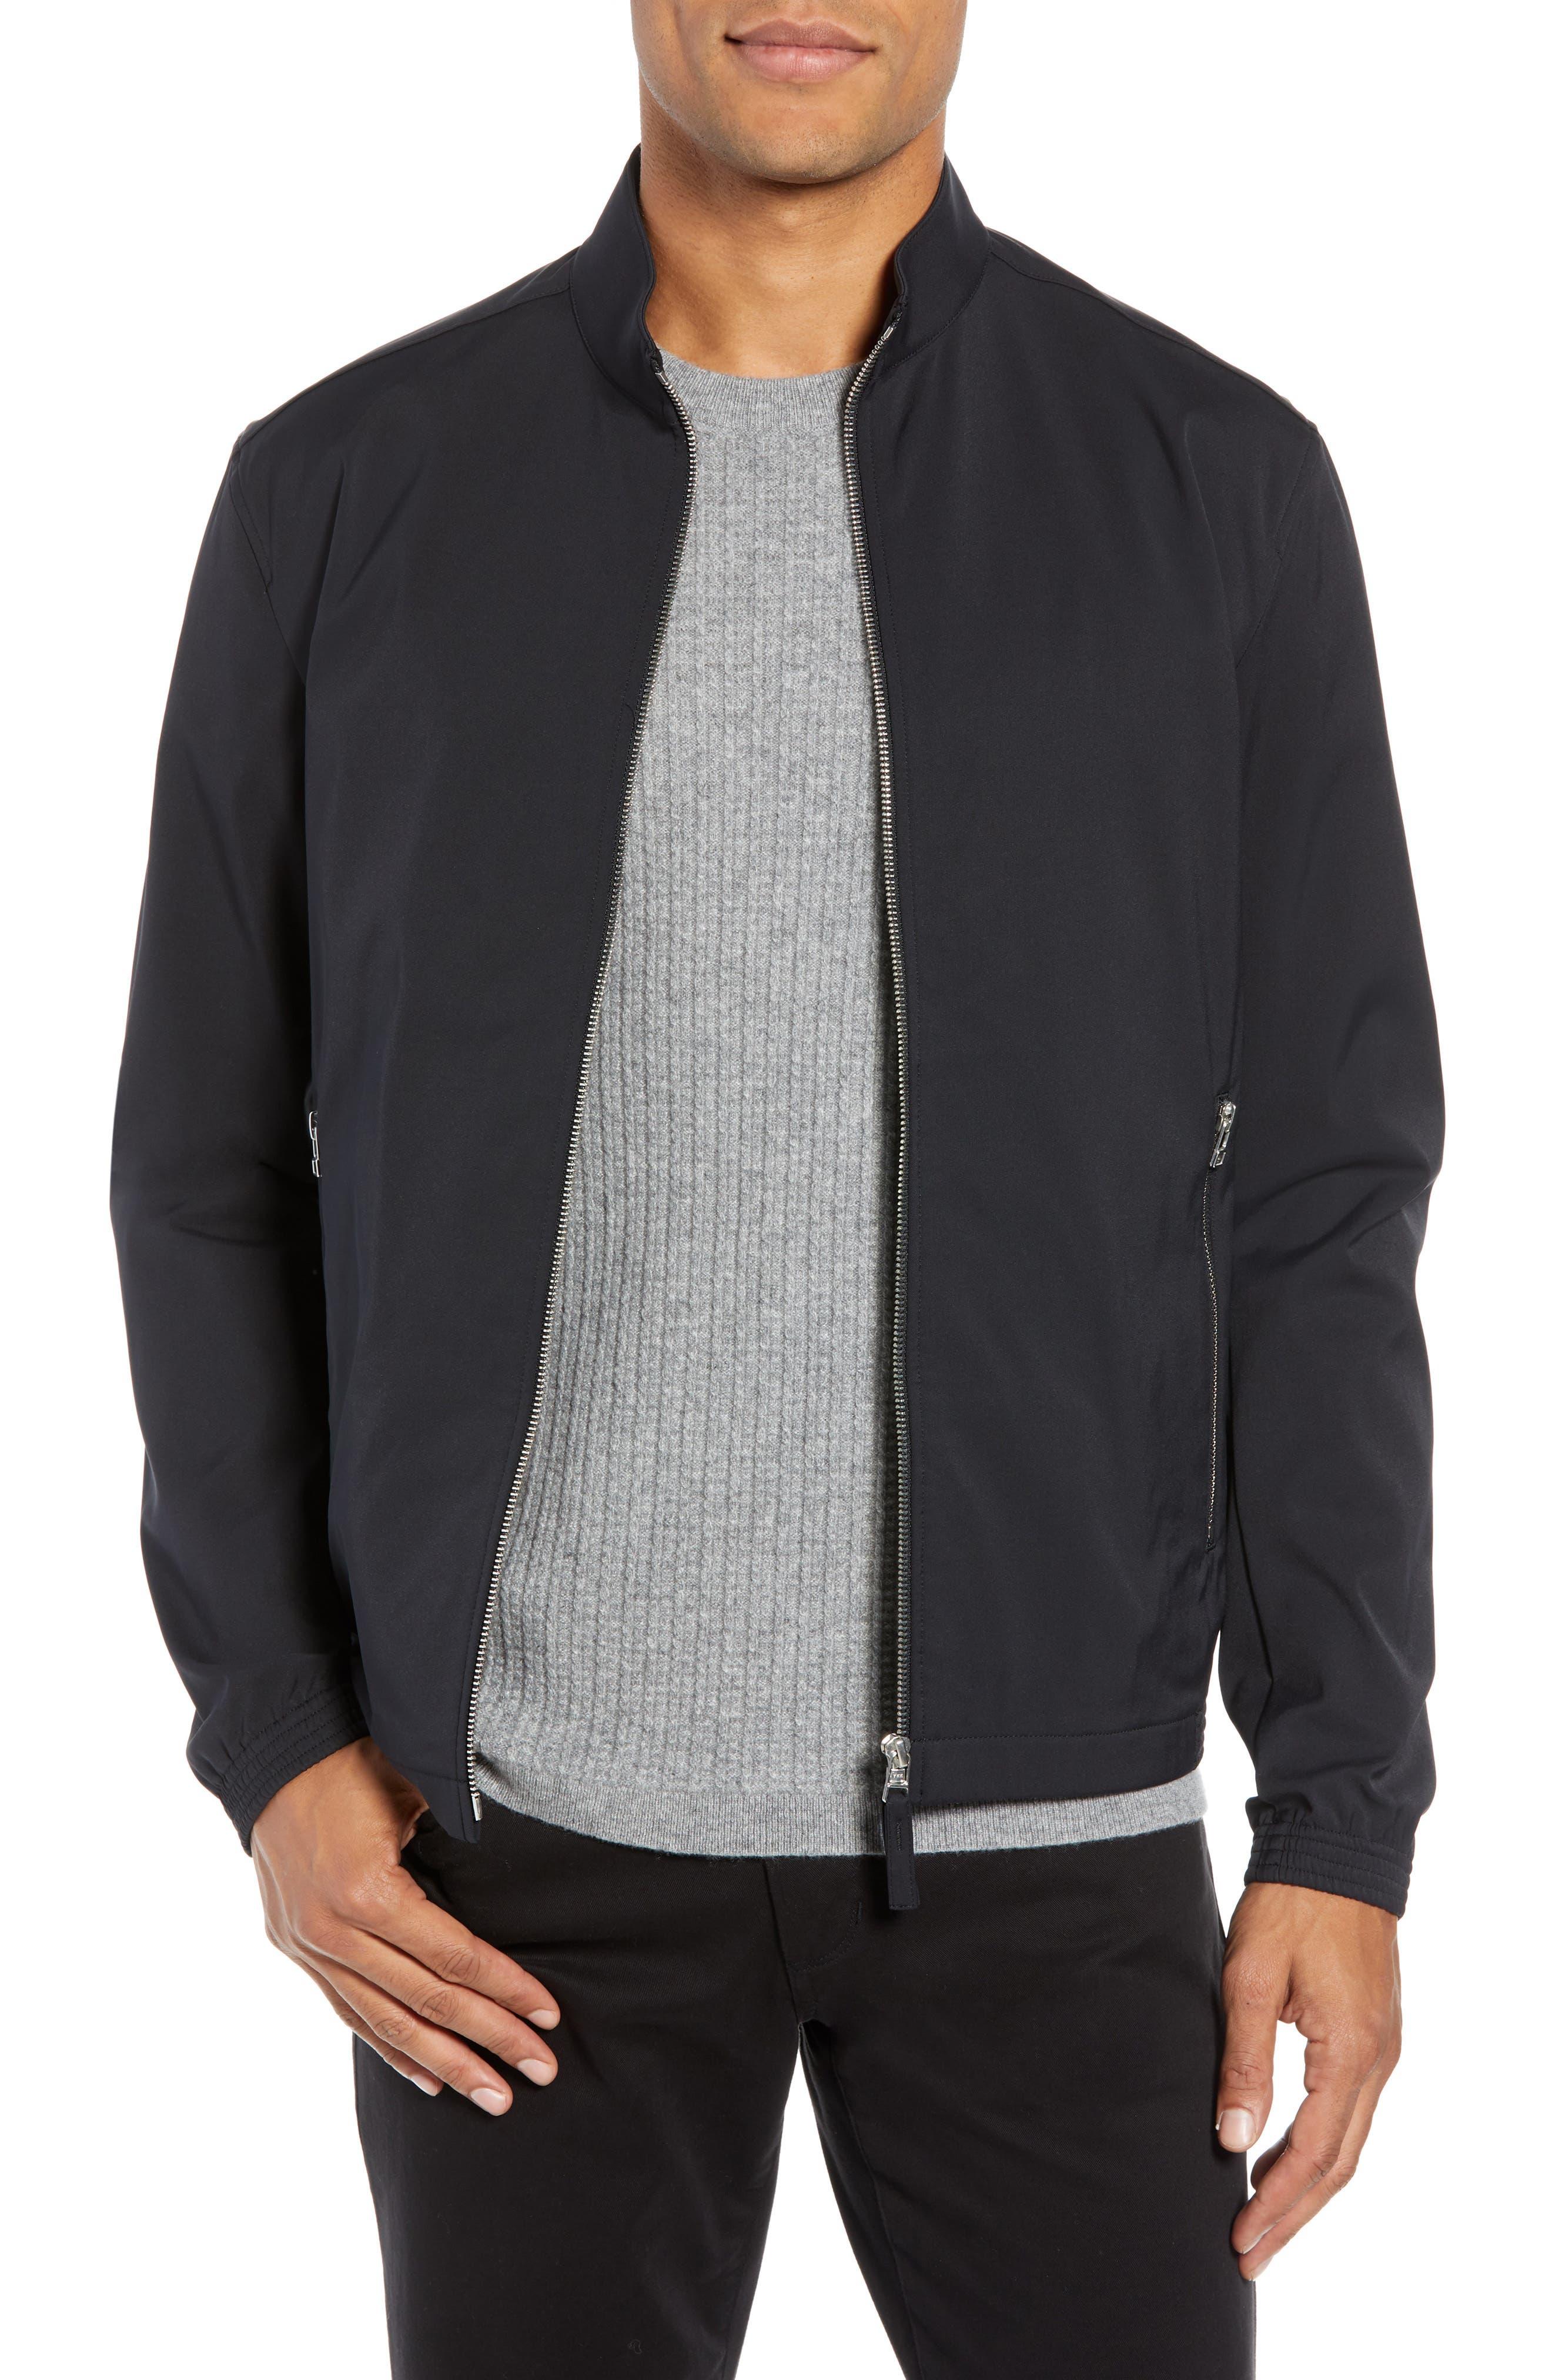 Tremont Neoteric Regular Fit Jacket,                             Main thumbnail 1, color,                             BLACK